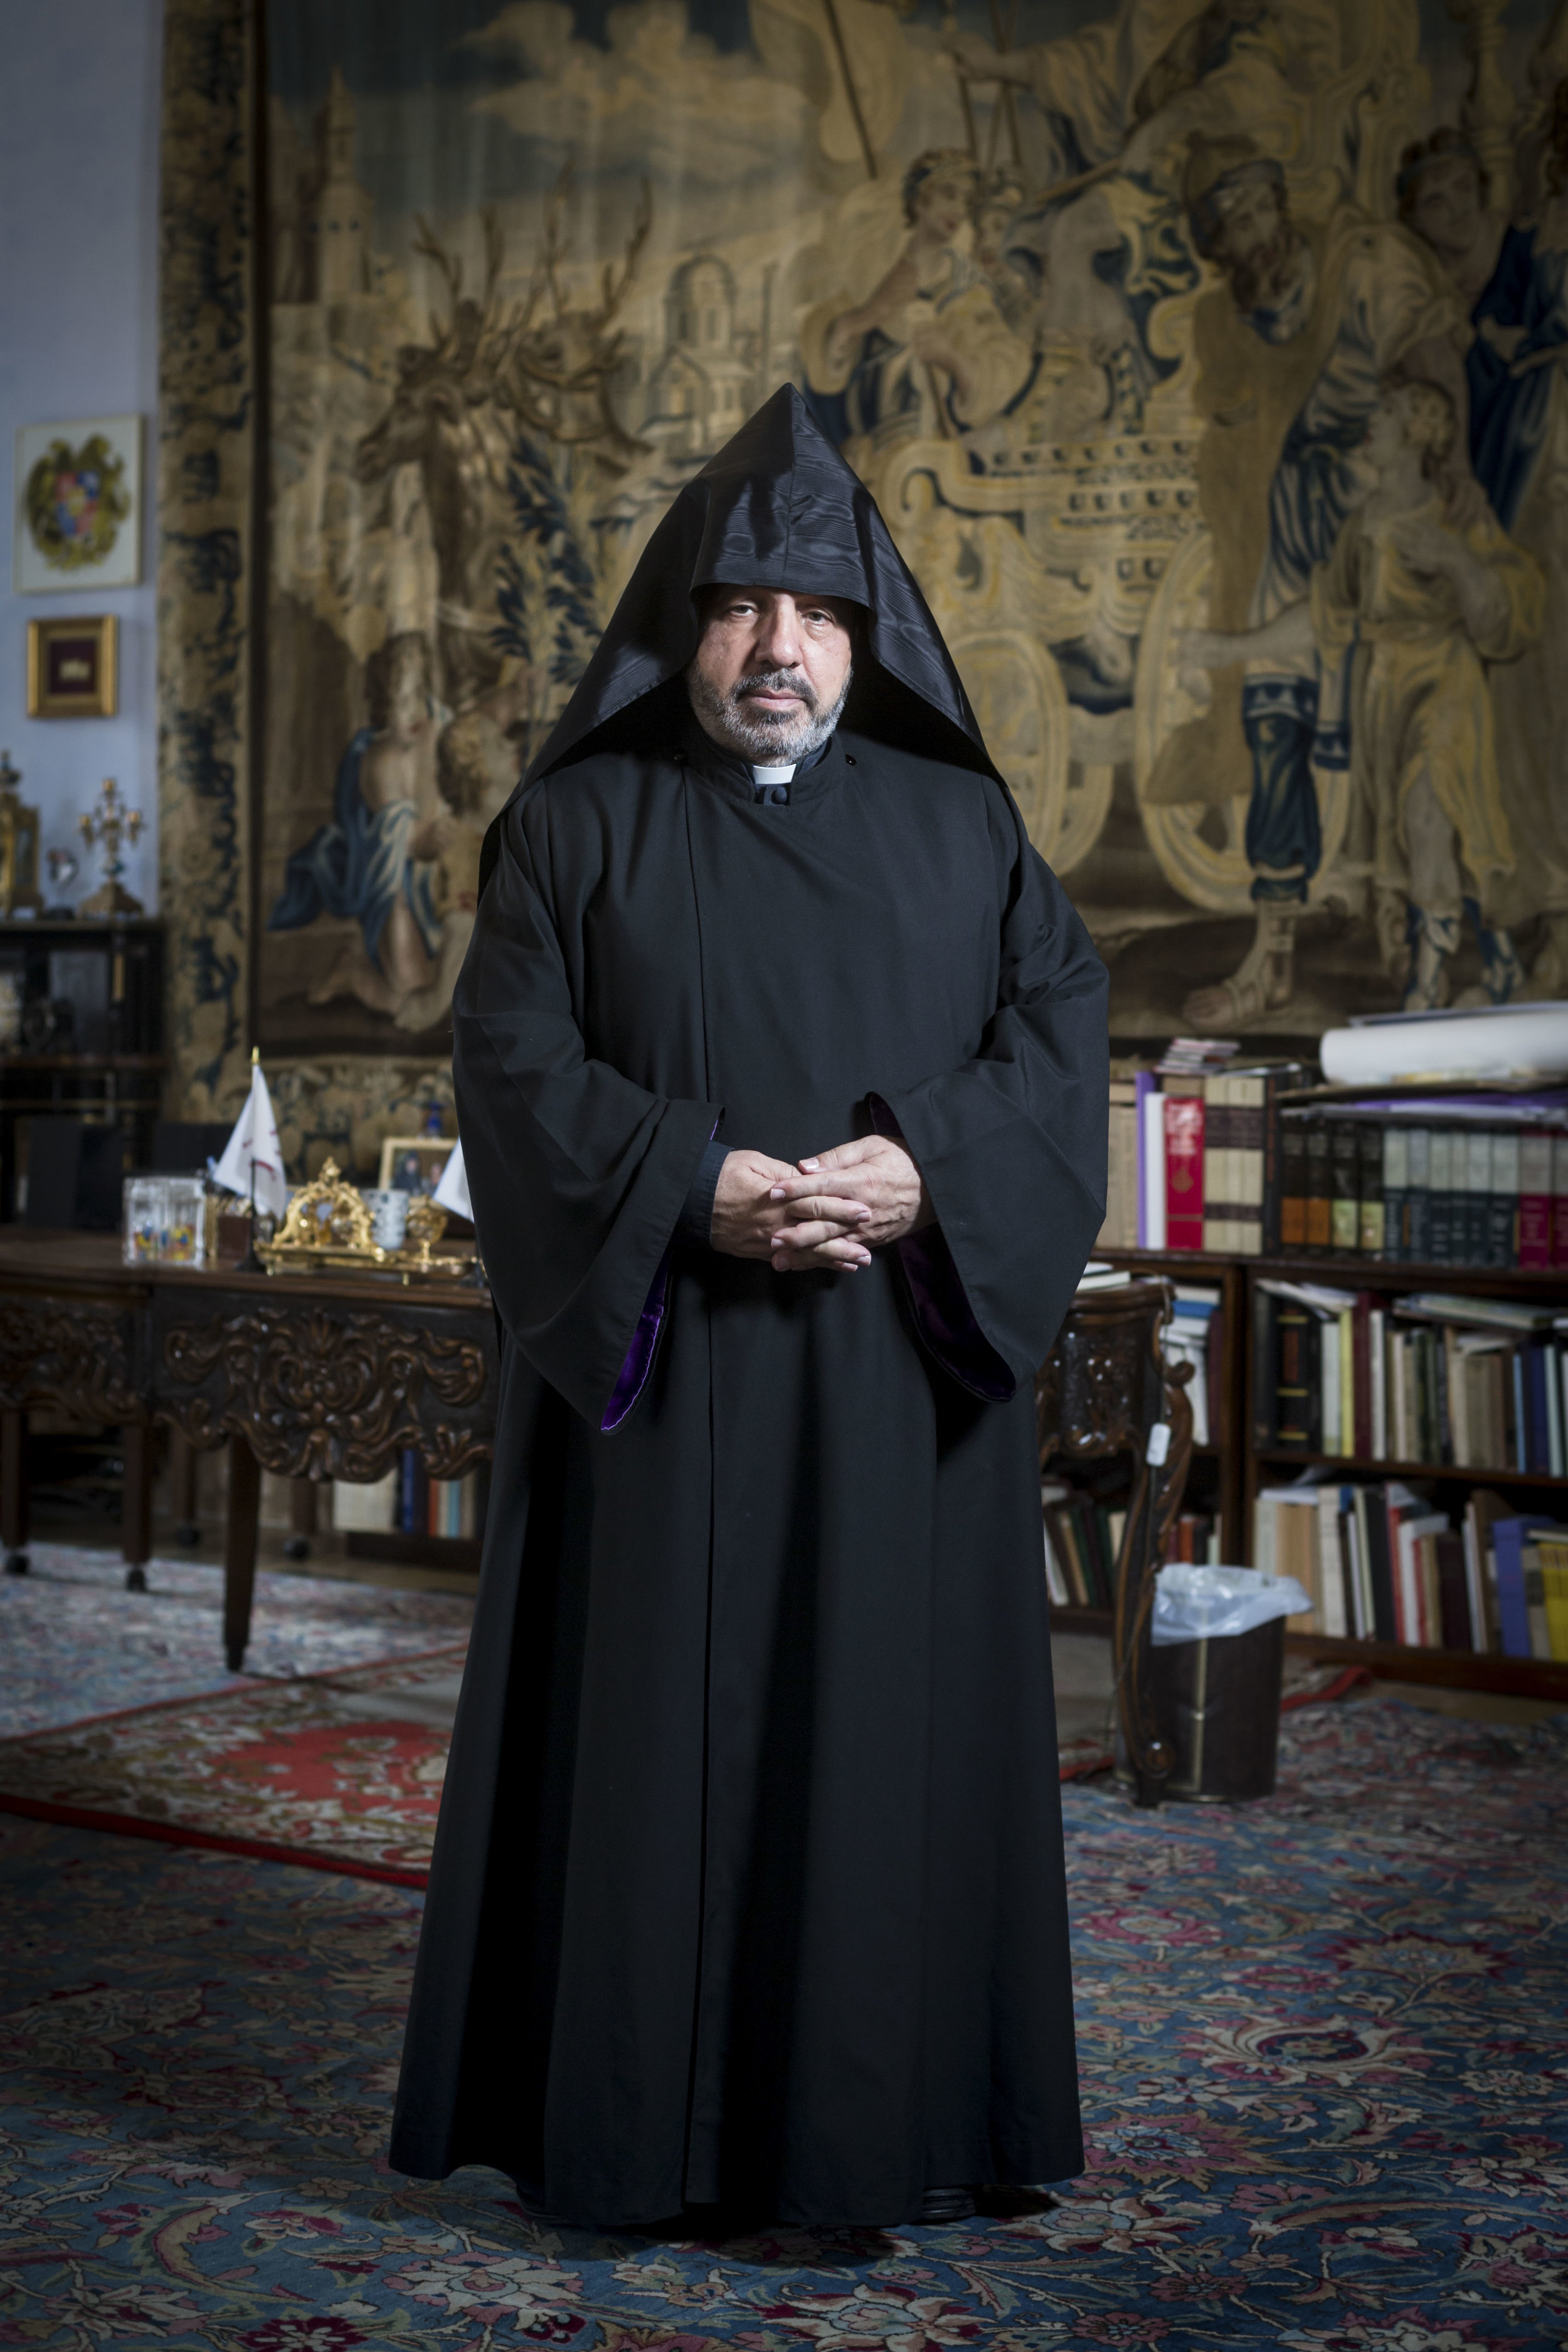 Portrait of Archbishop Nourhan Manougian, Patriarch of the Armenian Orthodox Patriarchate of Jerusalem in Jerusalem's Old City